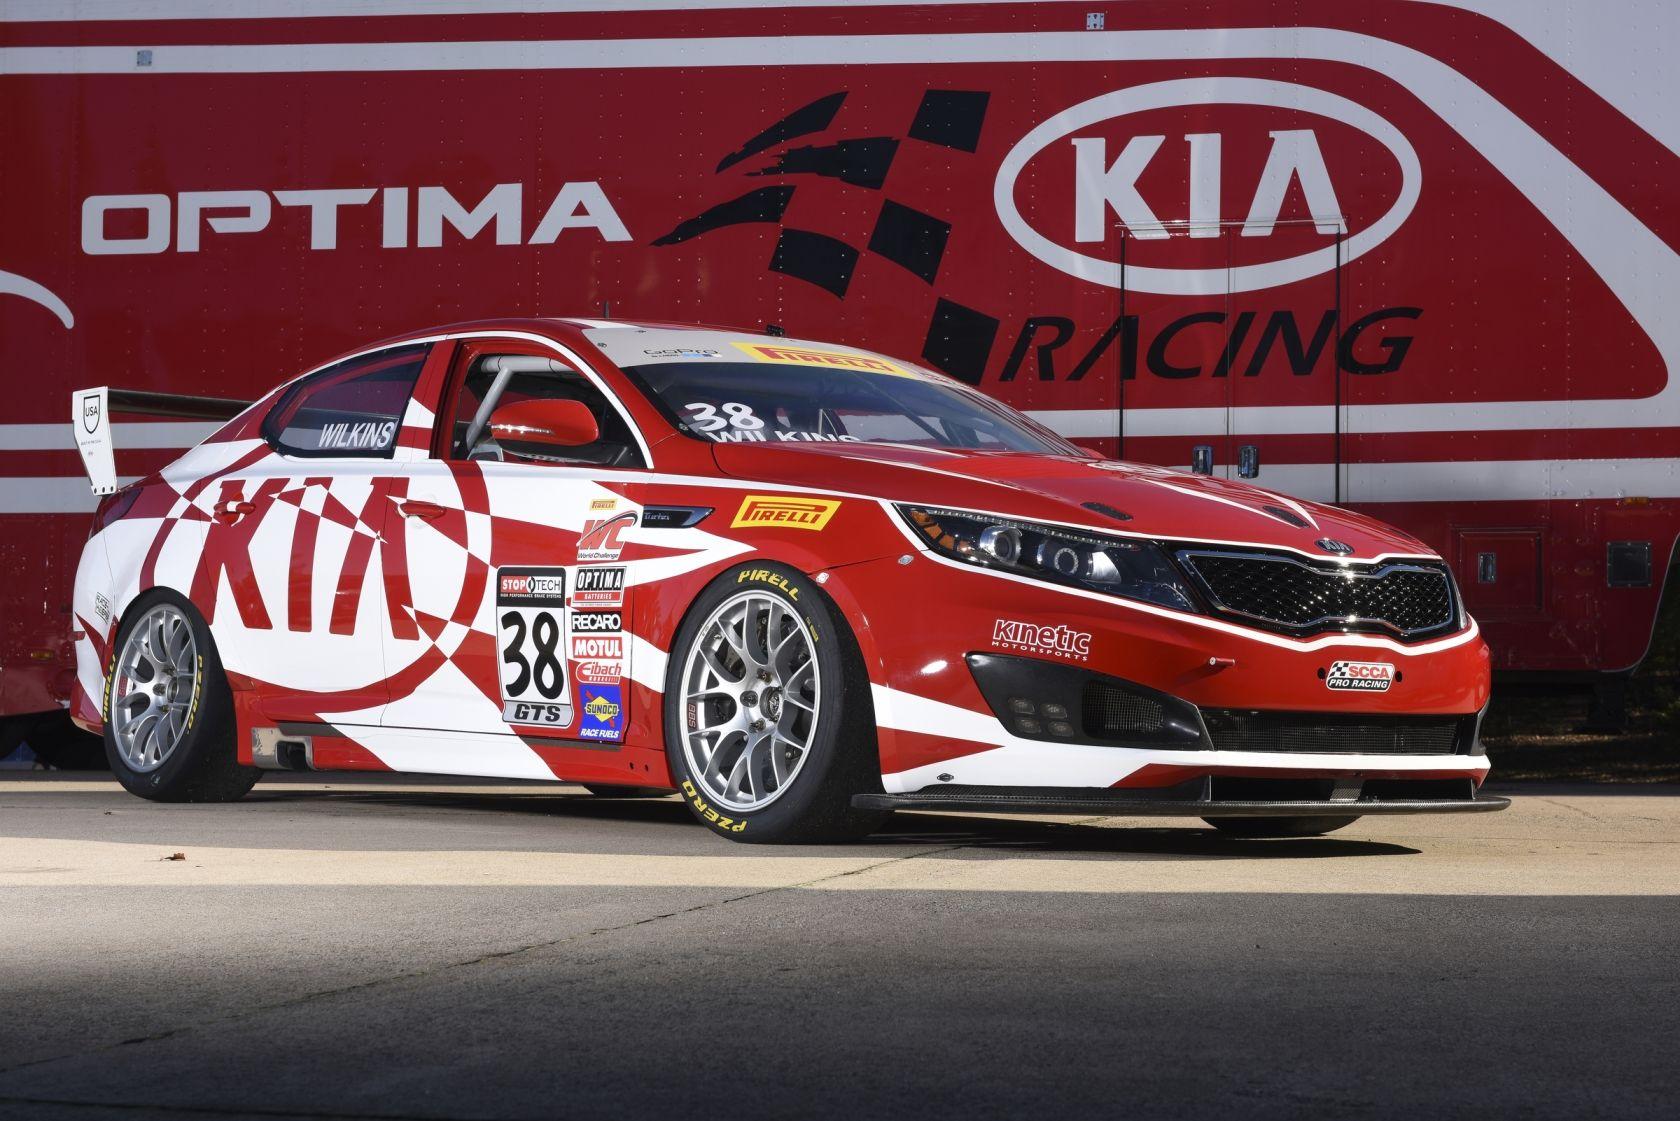 Kia Racing Optima Unveils New Paint Scheme Racing Motorsport Kia Kiaoptima Kiapotimaracing Pirelliworldchallenge Carsgm Racegm Raceglobal